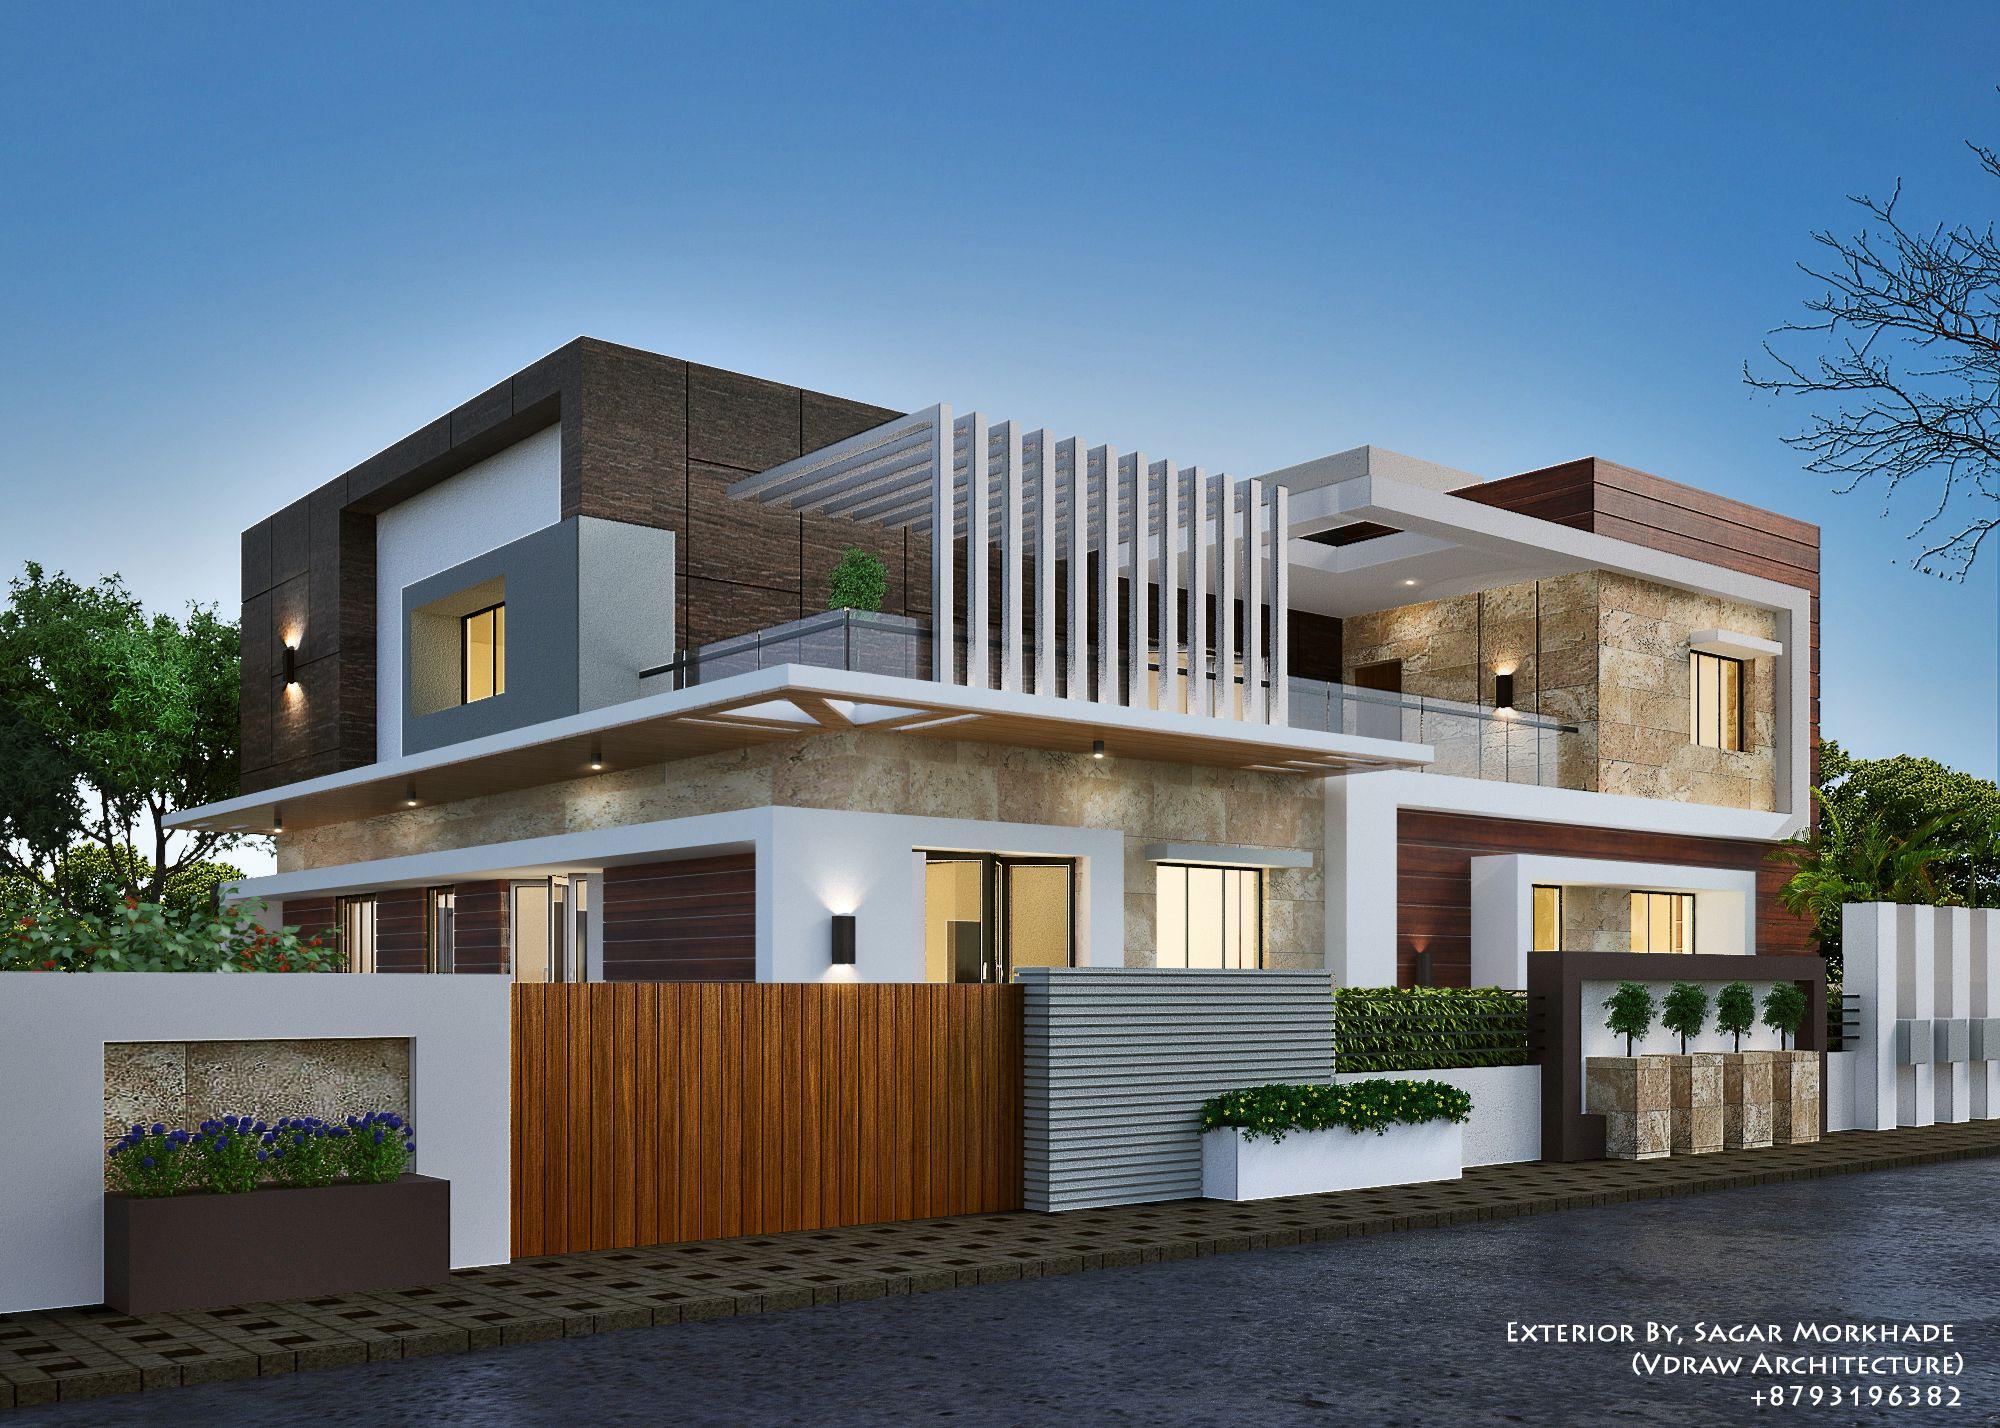 Superior Exterior By, Sagar Morkhade (Vdraw Architecture) +8793196382